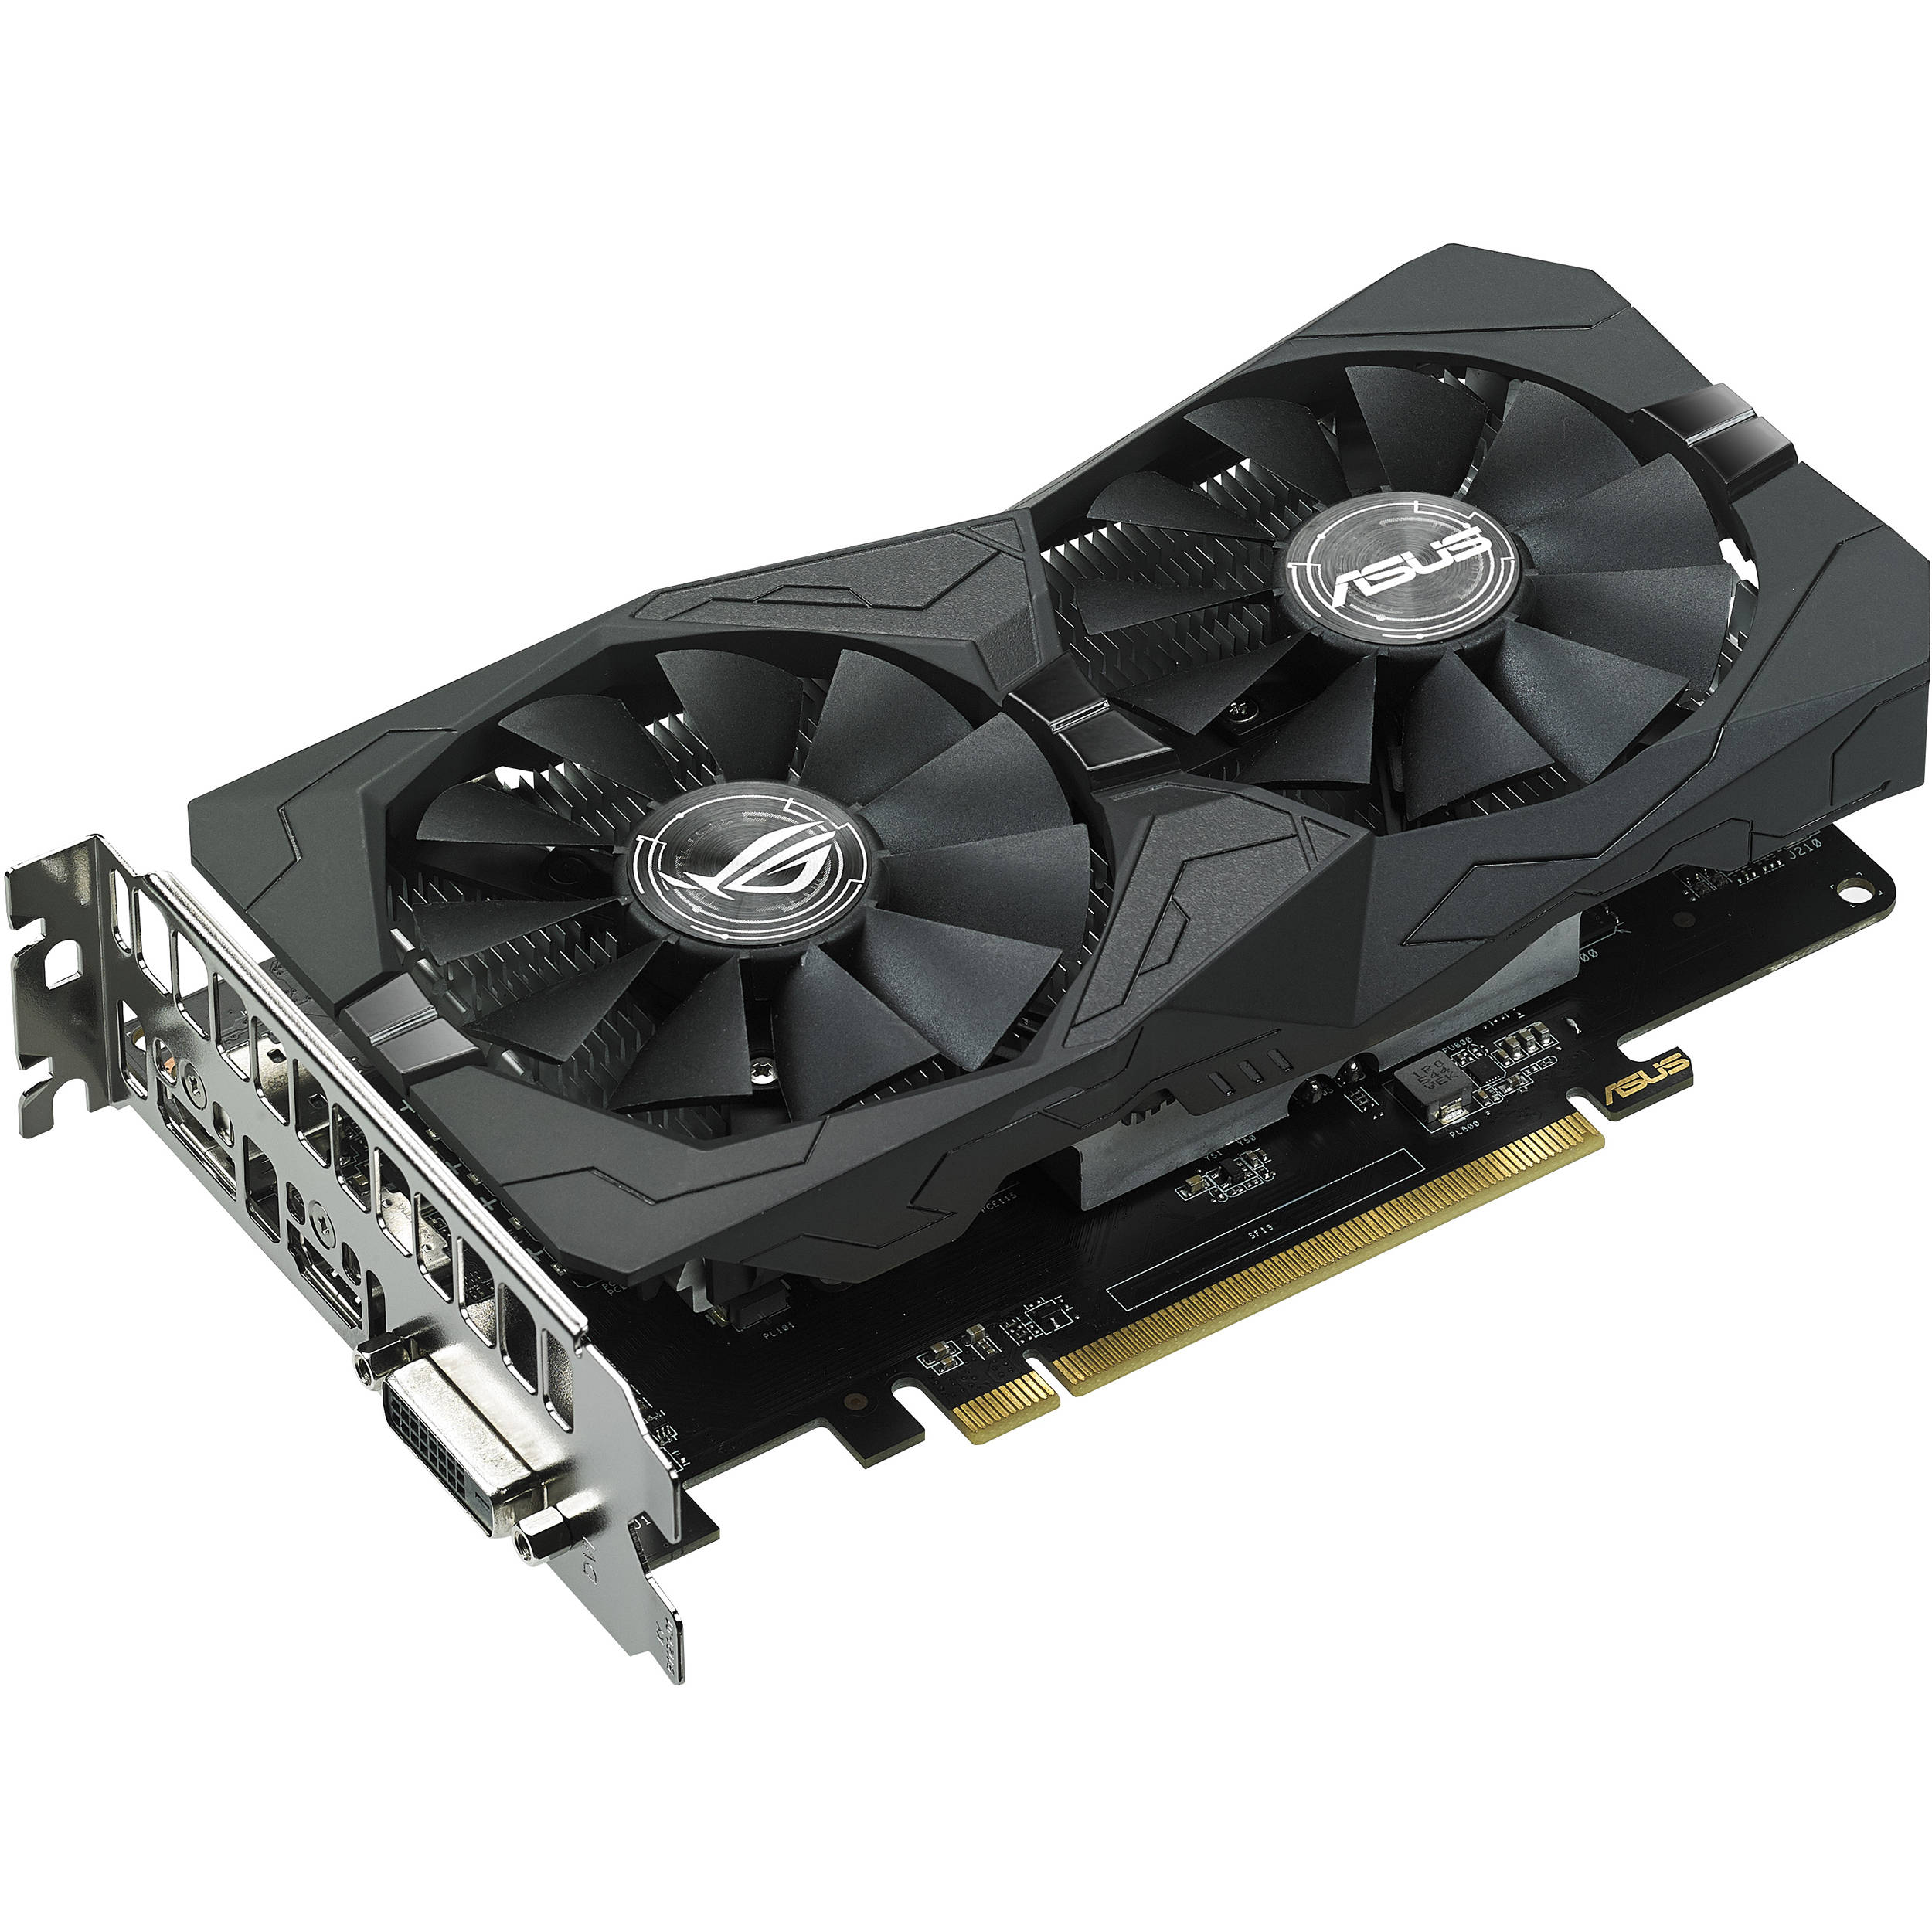 ASUS Republic of Gamers Strix Radeon RX 560 Gaming Graphics Card